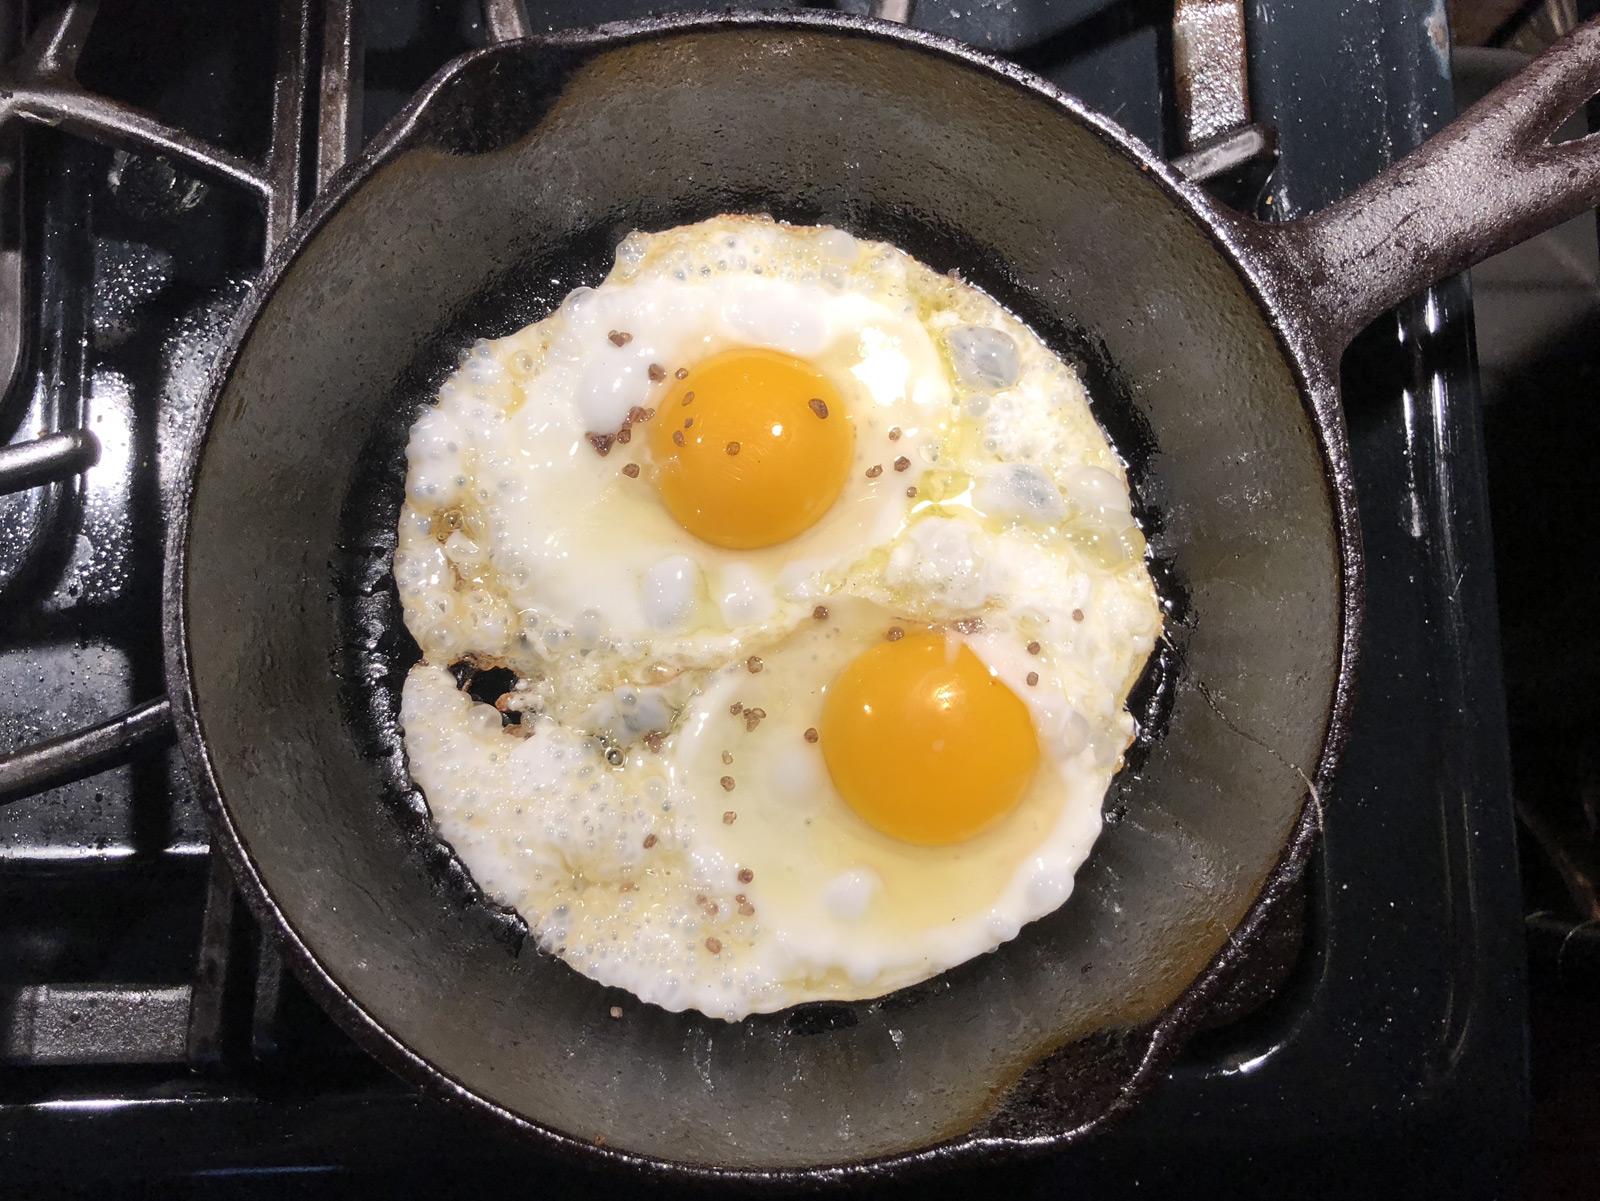 cast-iron-skillet-eggs.jpg